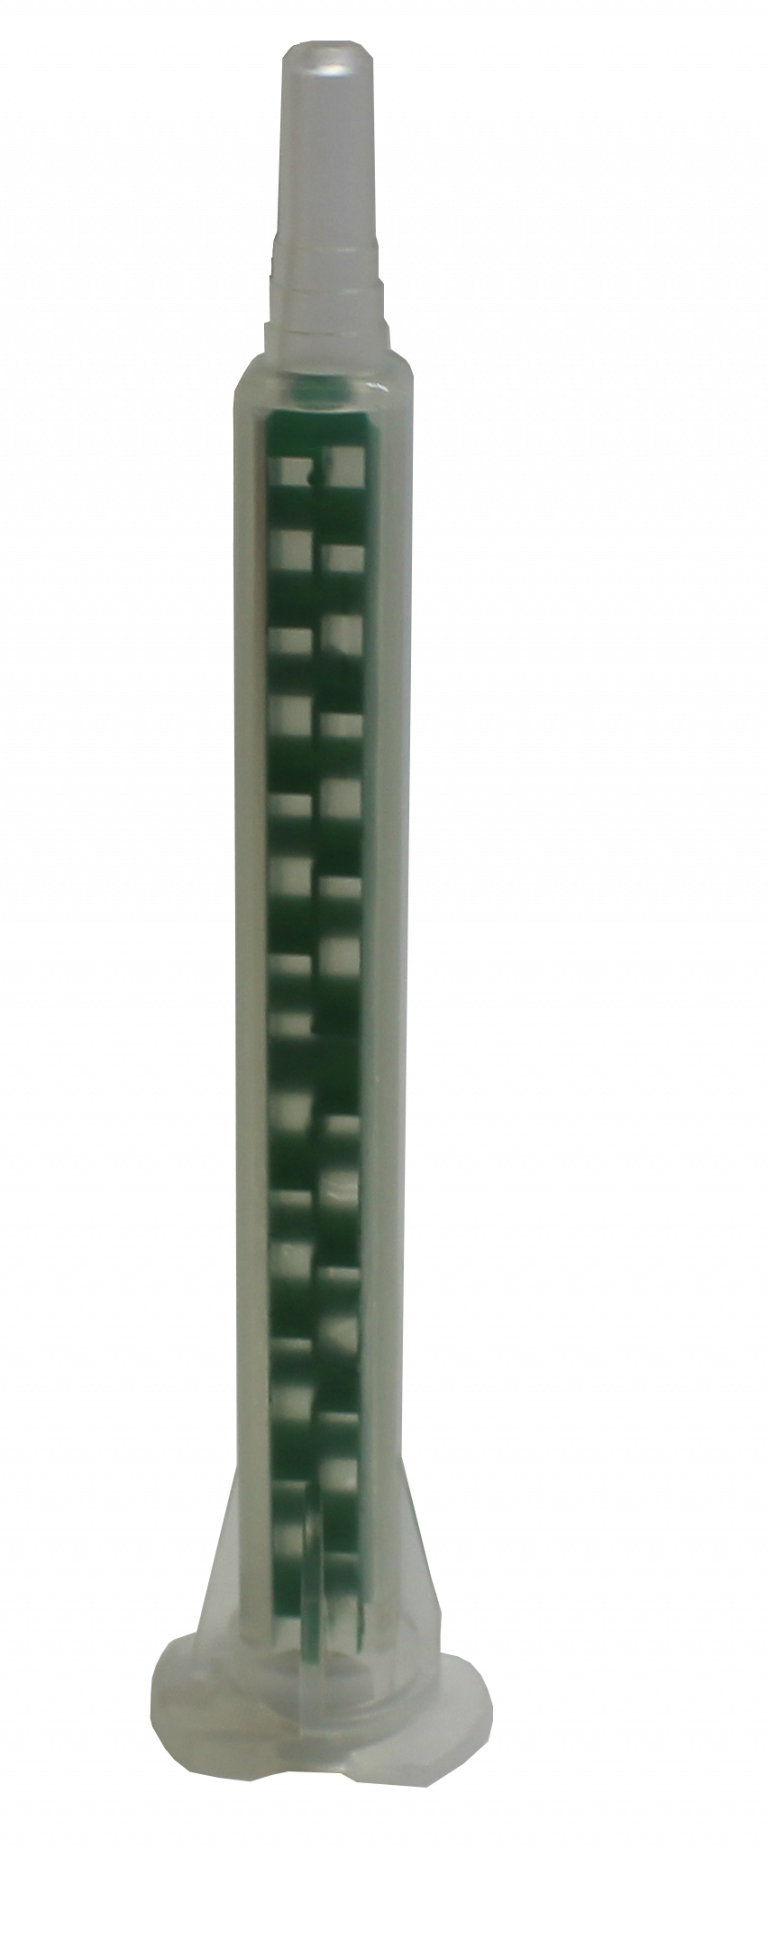 Sulzer 16 Element 300-028 Quadro Mixer